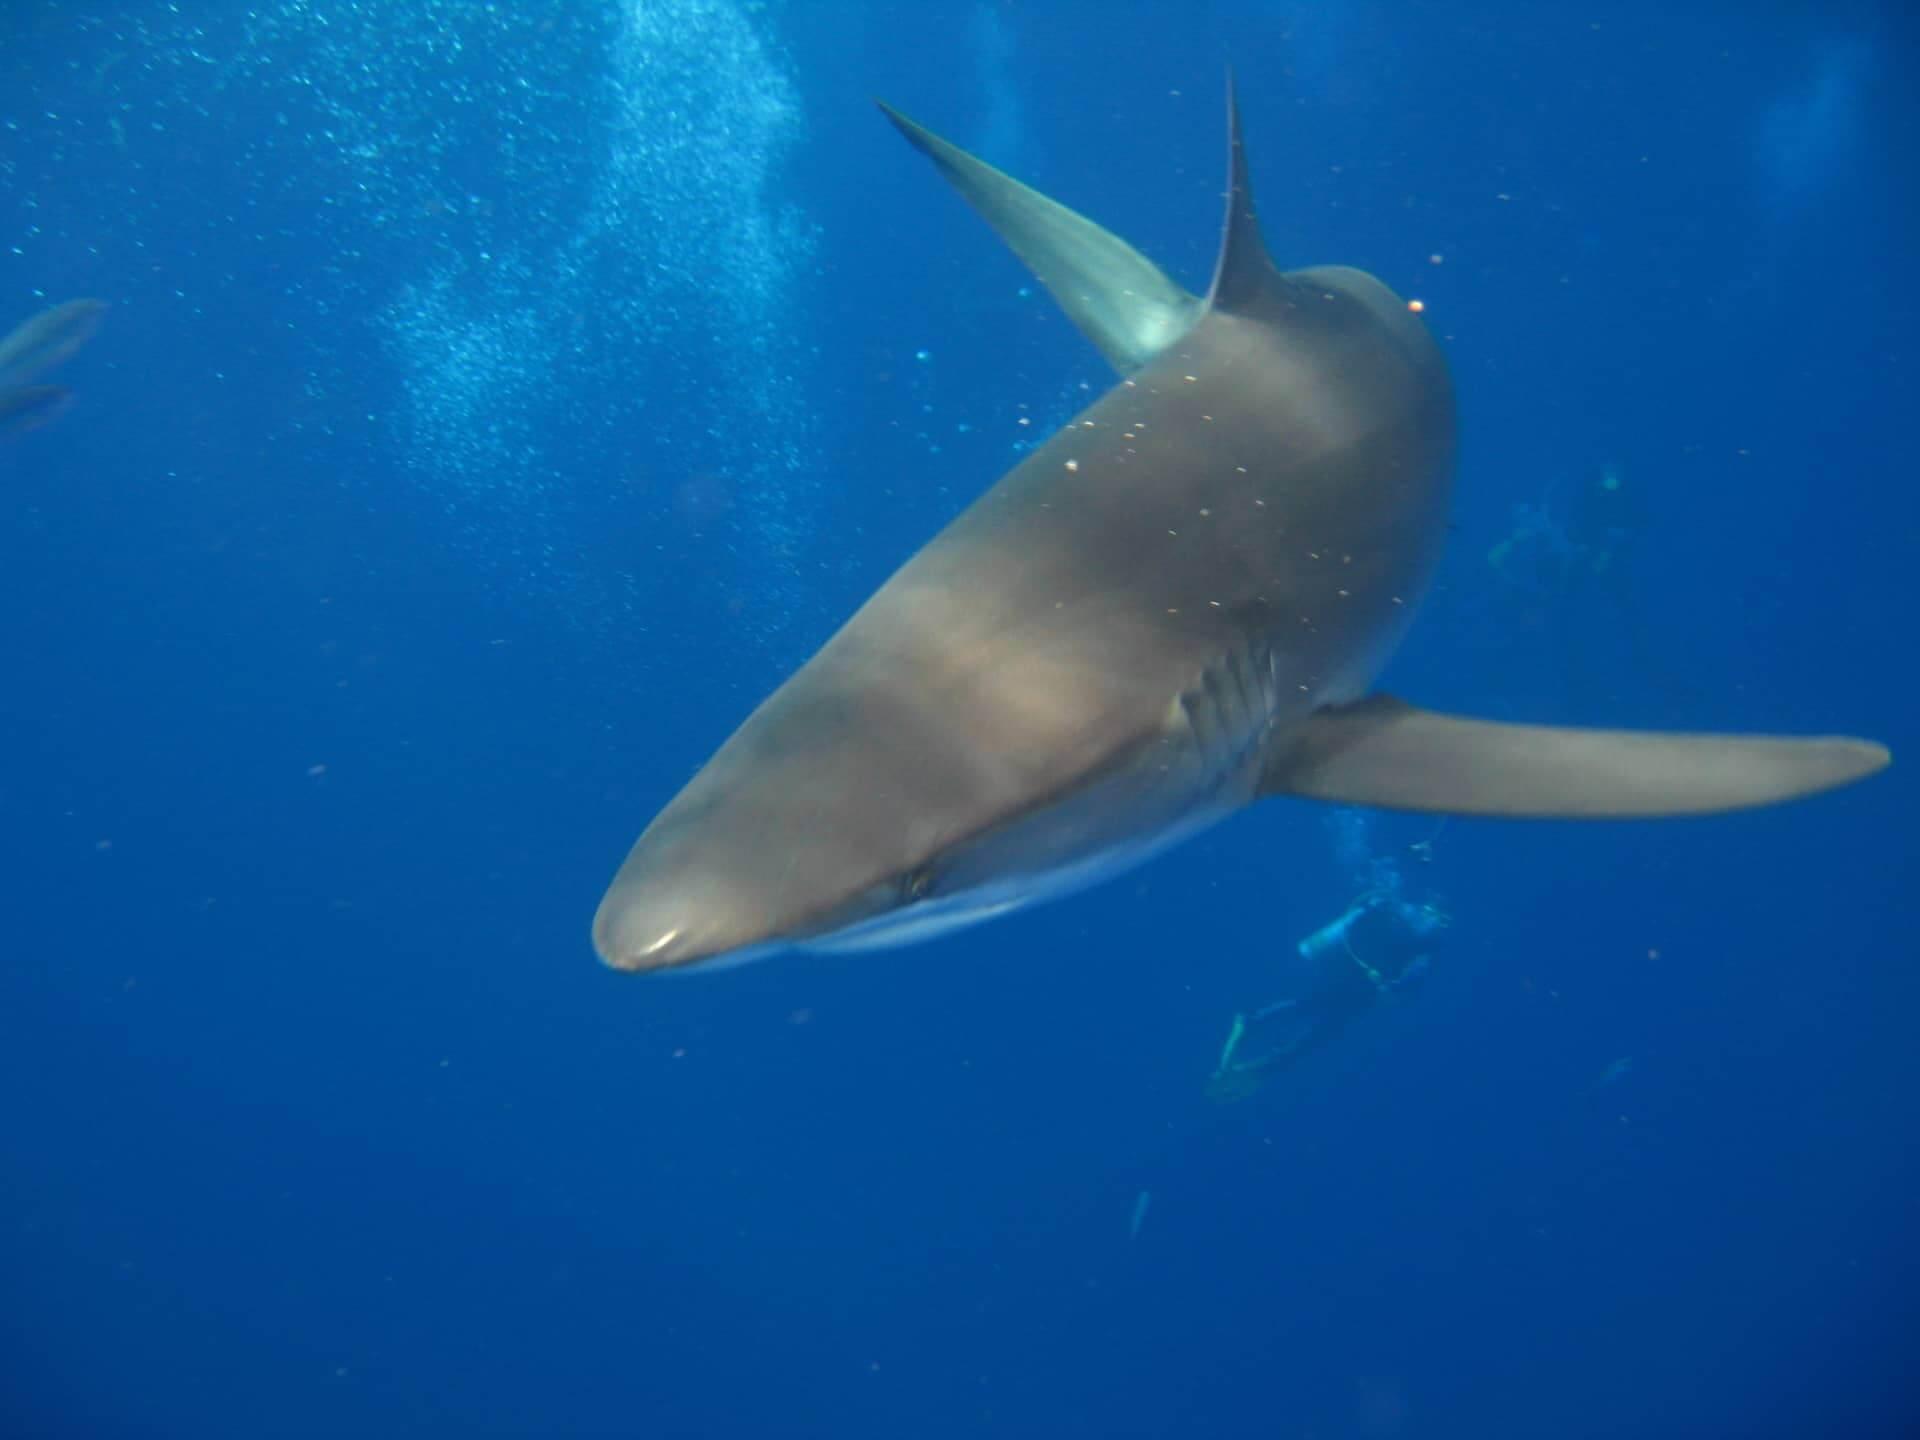 Egypt-REDSEA-Hurghada-DivePro-Academy-Scuba-Diving-Center-Shark-4